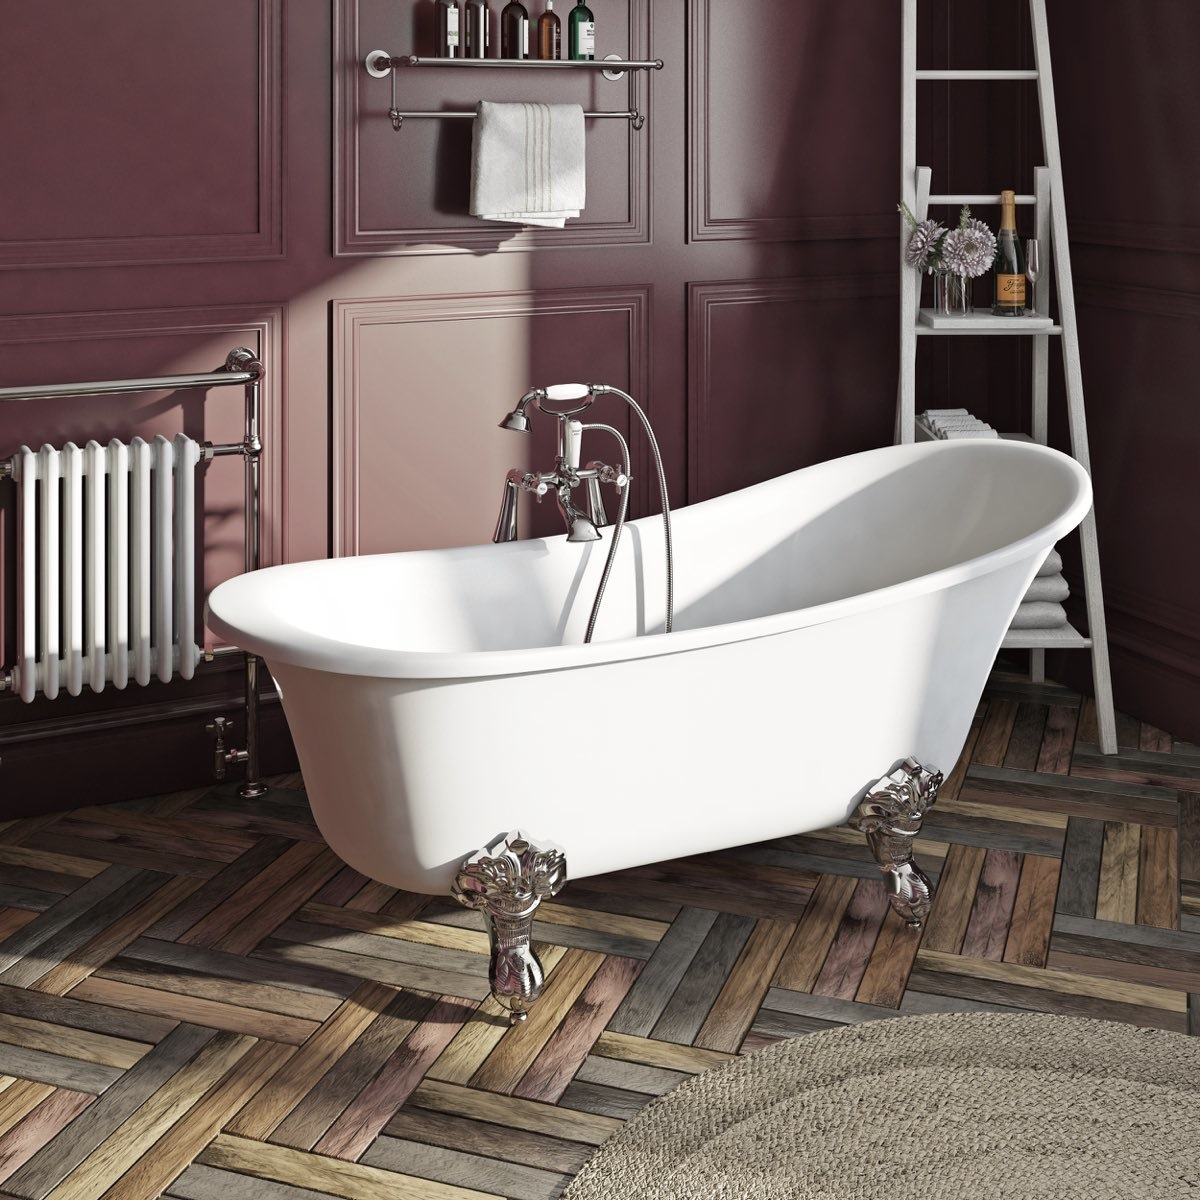 Elegant Elsie freestanding bath